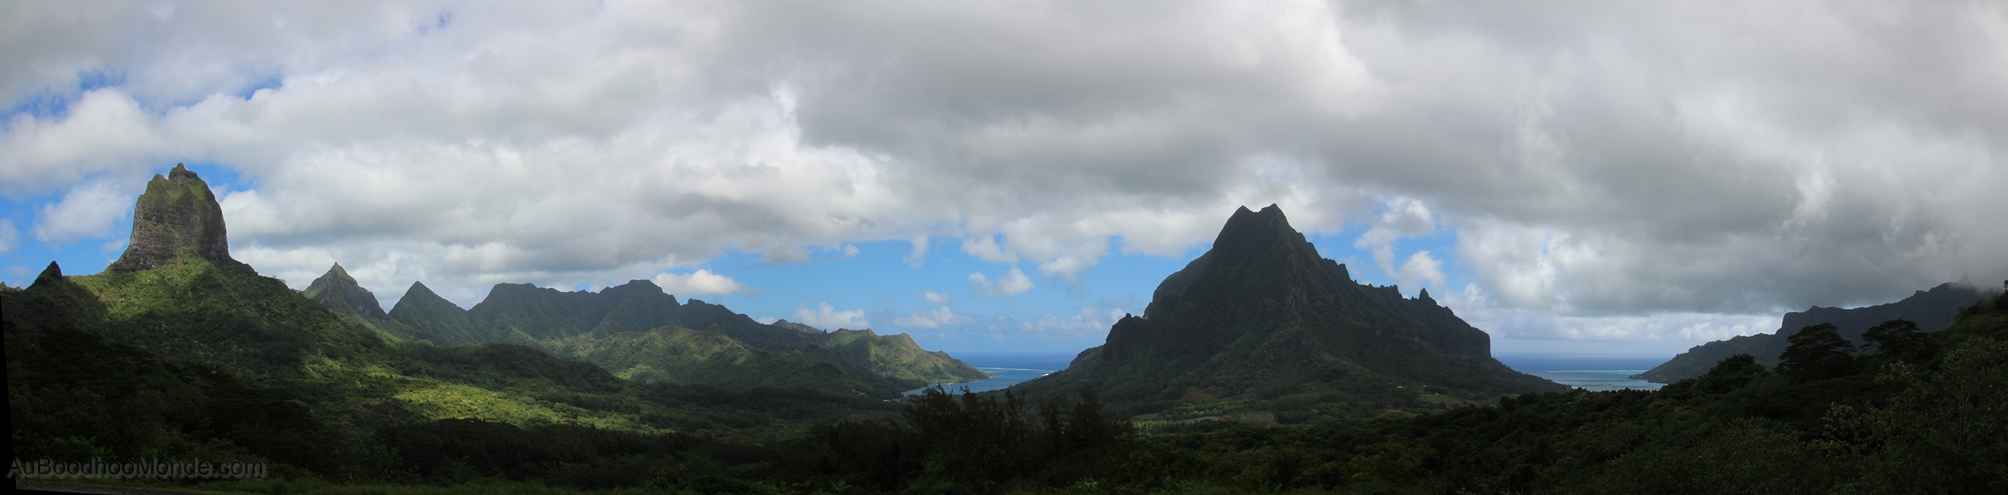 Moorea - Baies Cook et Opunohu